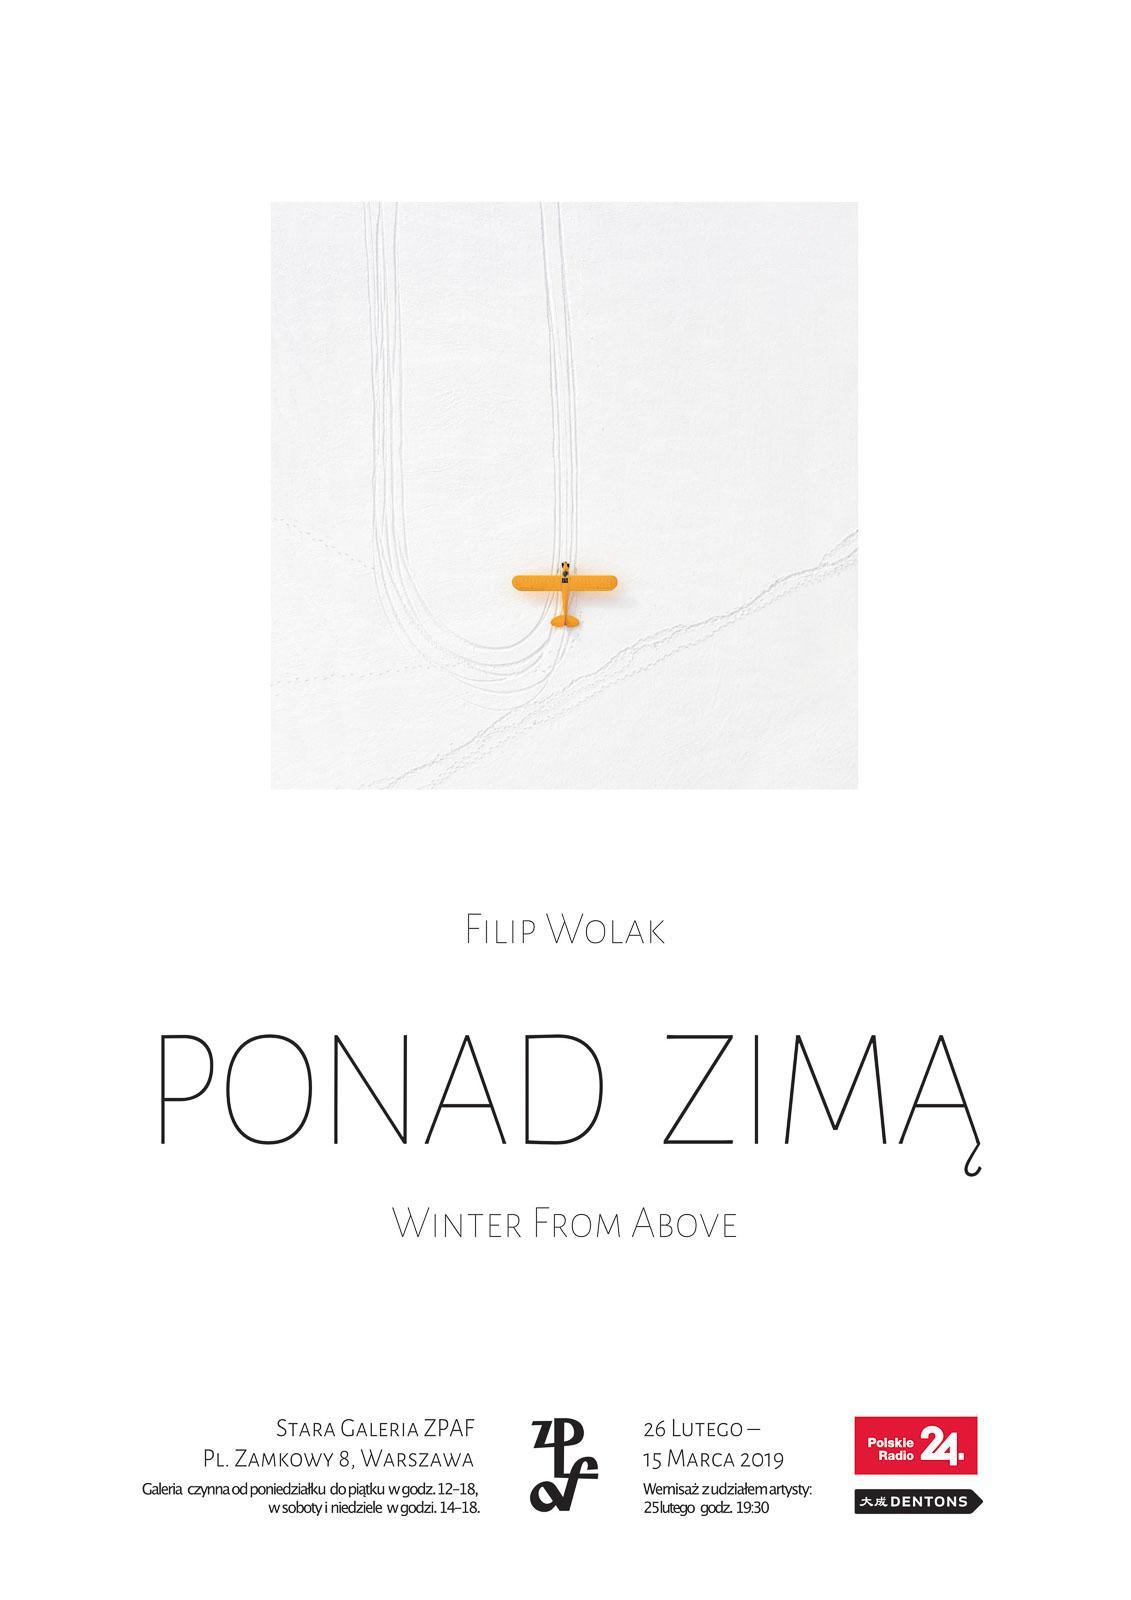 Ponad Zima – Wozownia, Torun – ZPAF Warszawa